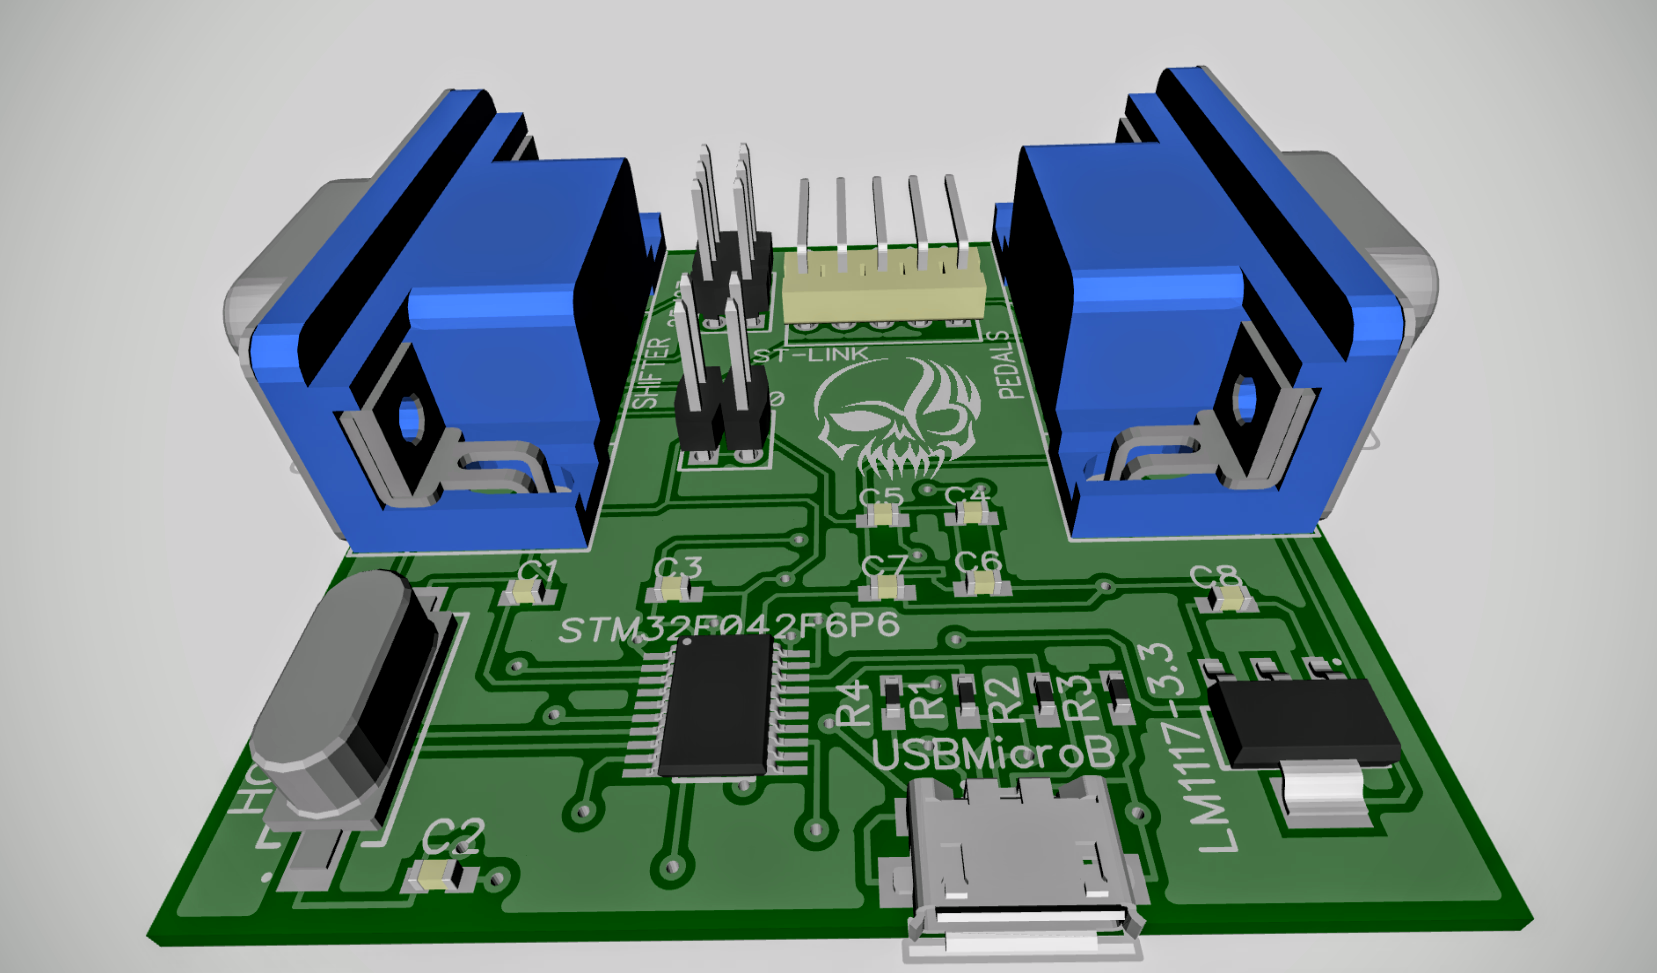 Адаптер педалей и-или шифтера Logitech G25-G27 на STM32 - 3